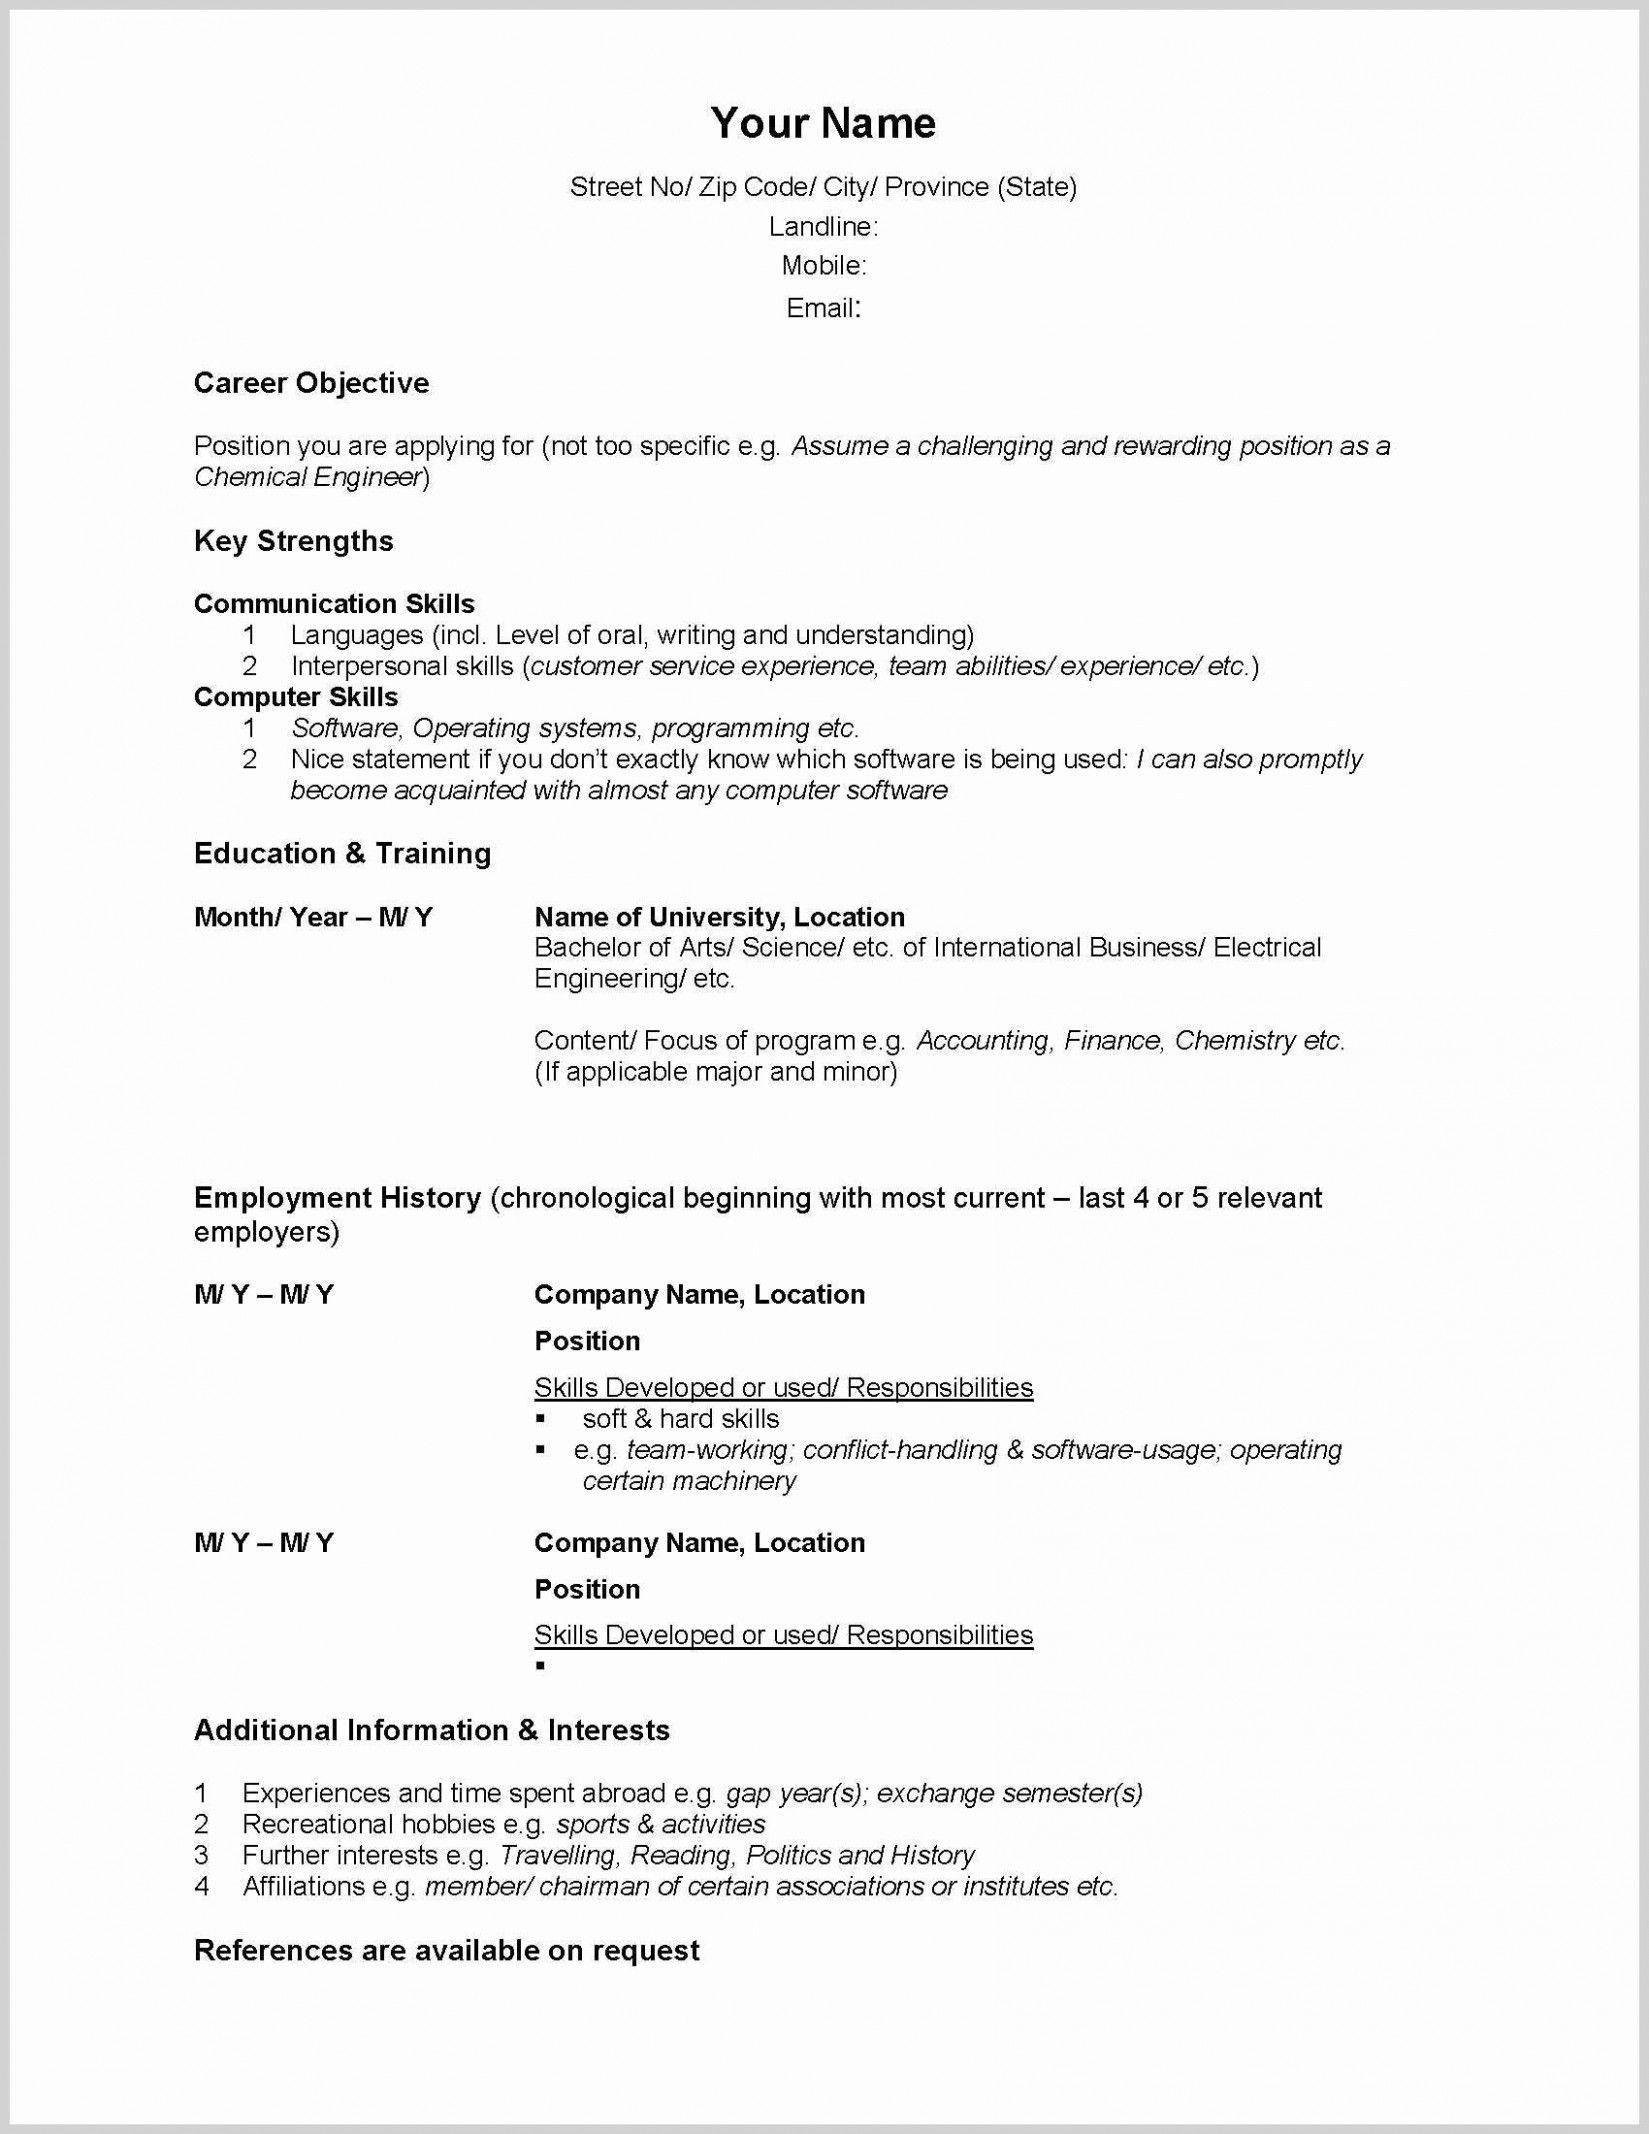 2020 Resume Templates Canada